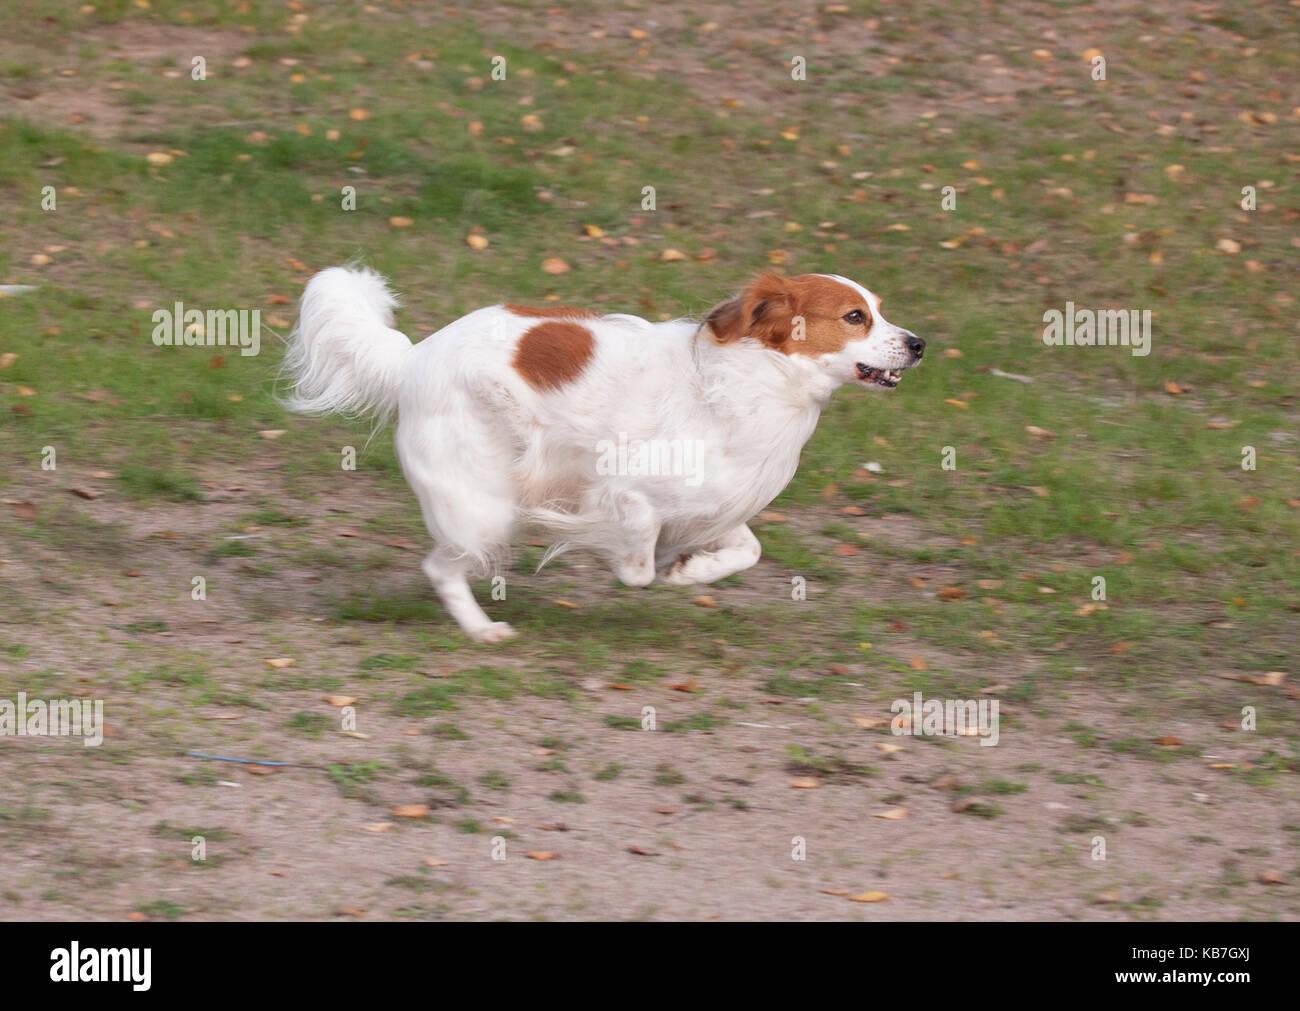 The KOOIKERHONDJE 2017 is a Spaniel type of dog of Dutch ancestry - Stock Image